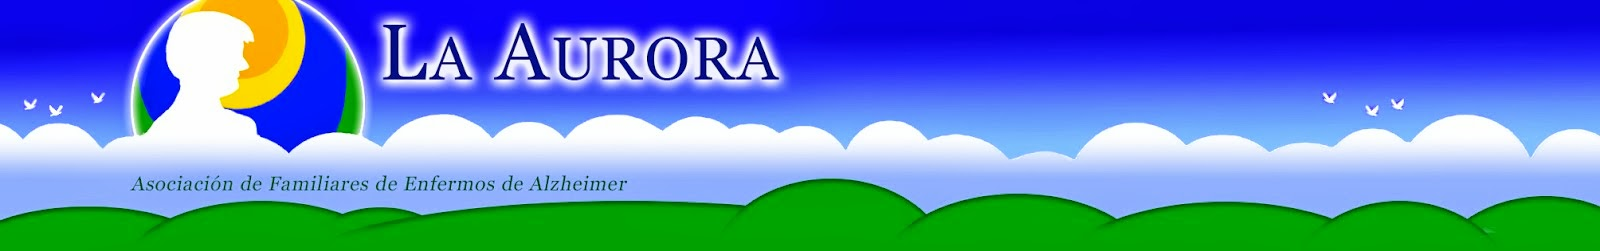 AFA La Aurora